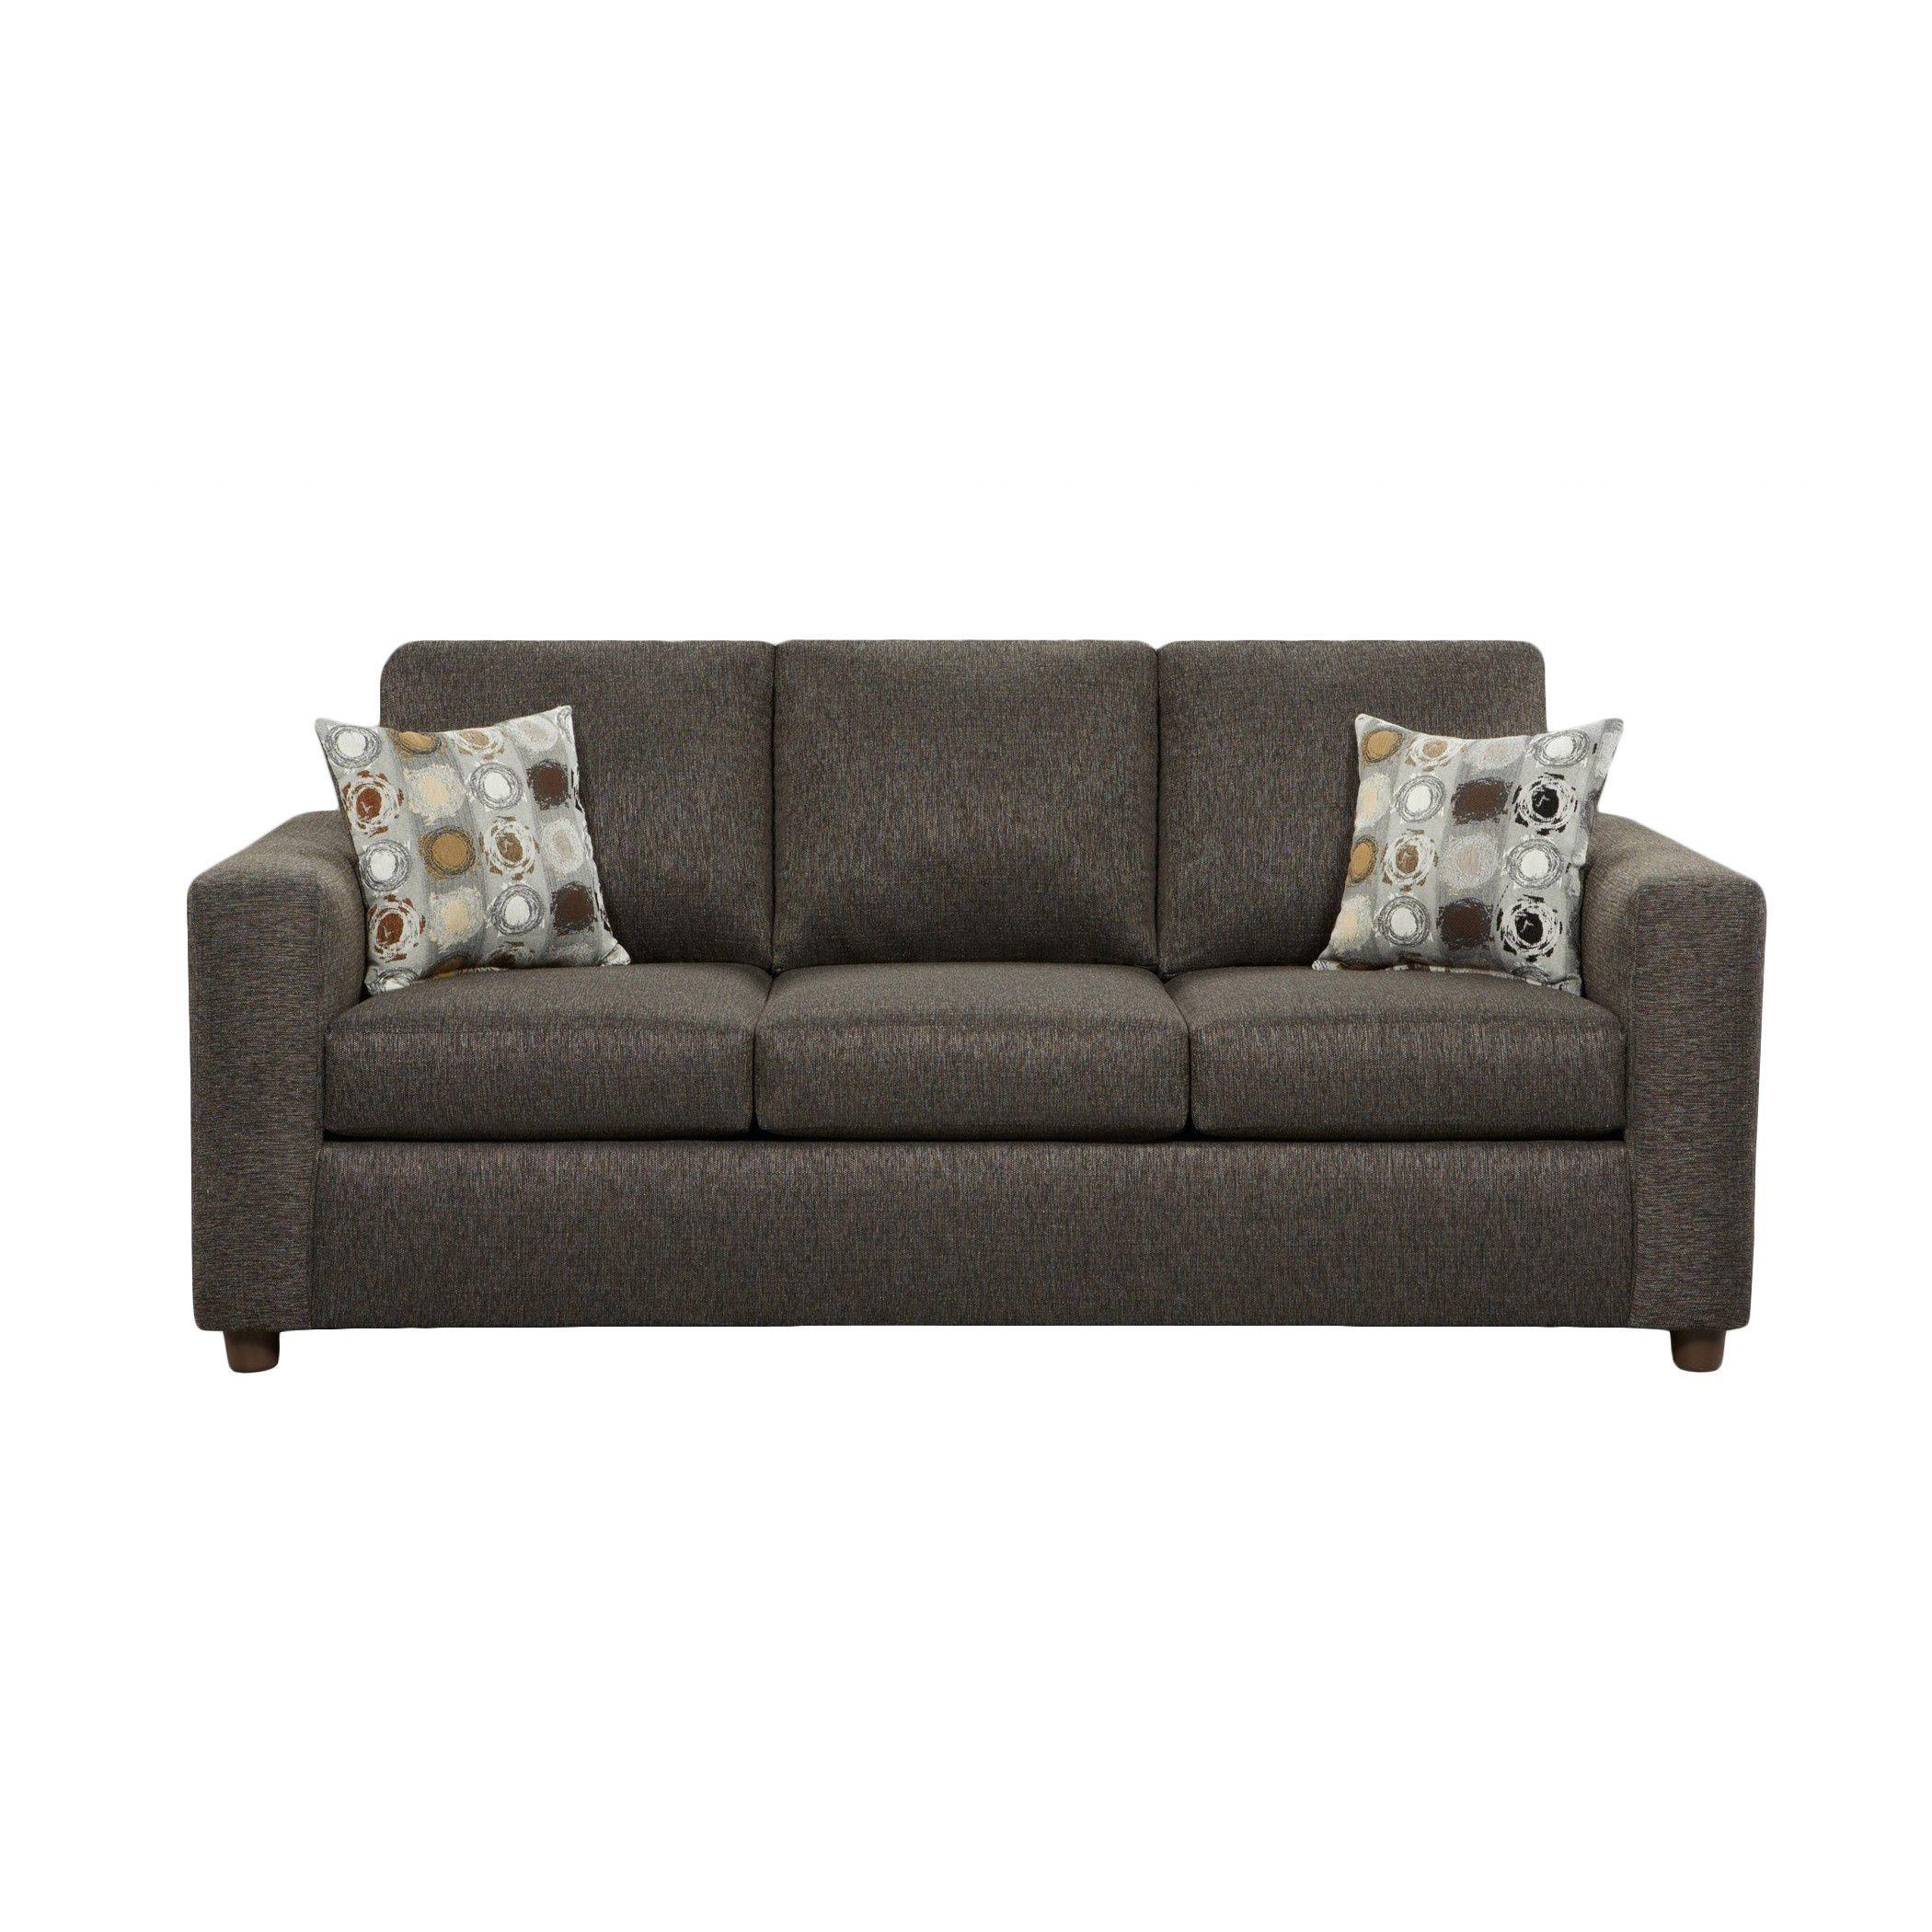 Online Shopping Bedding Furniture Electronics Jewelry Clothing More Fabric Sofa Beautiful Sofas Sofa